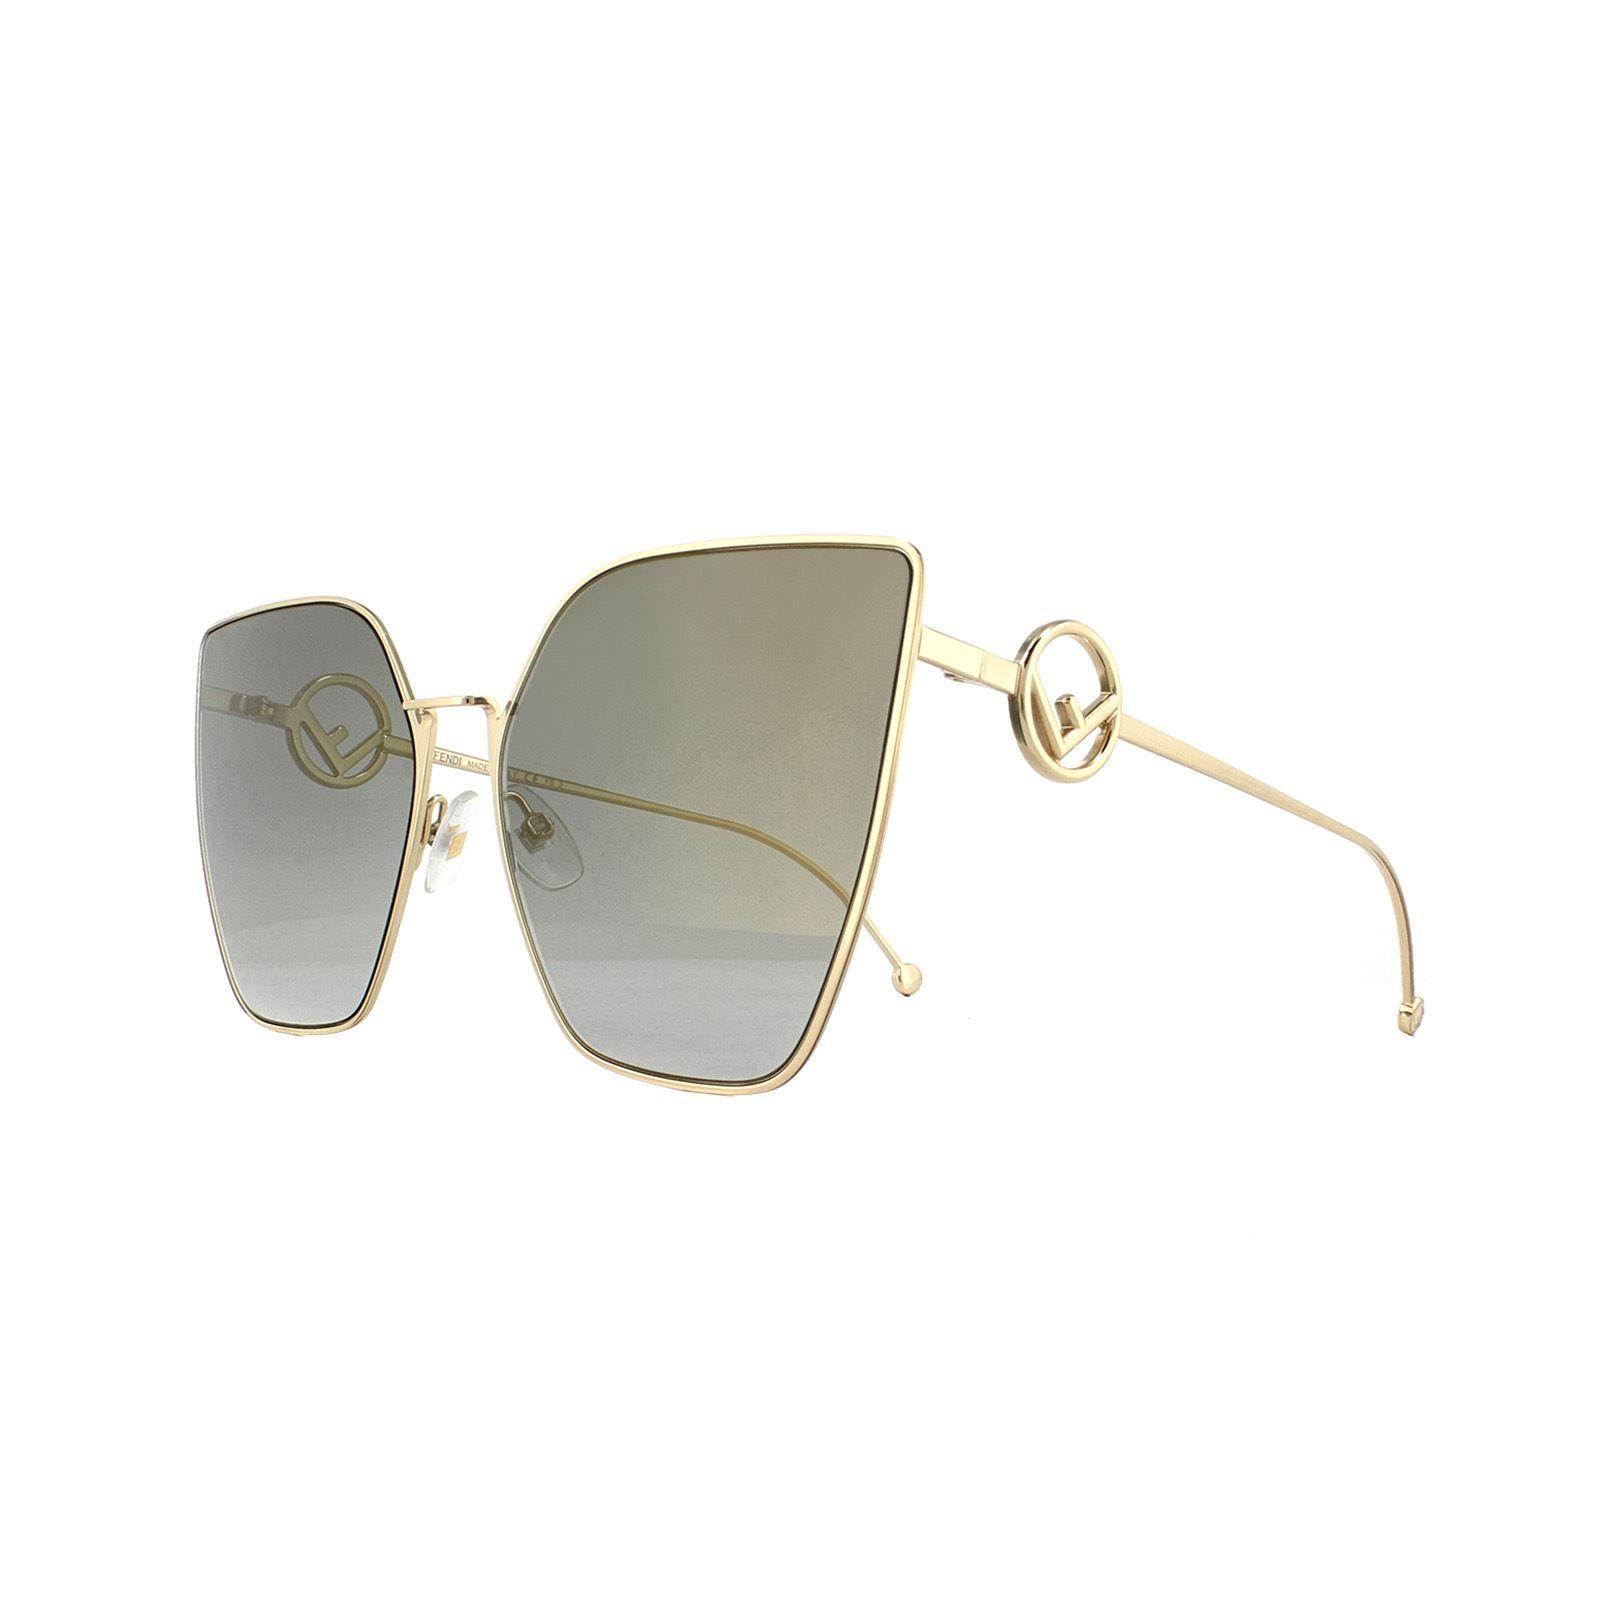 Fendi Sunglasses 0323/S FT3 FQ Light Gold Dark Grey Gradient